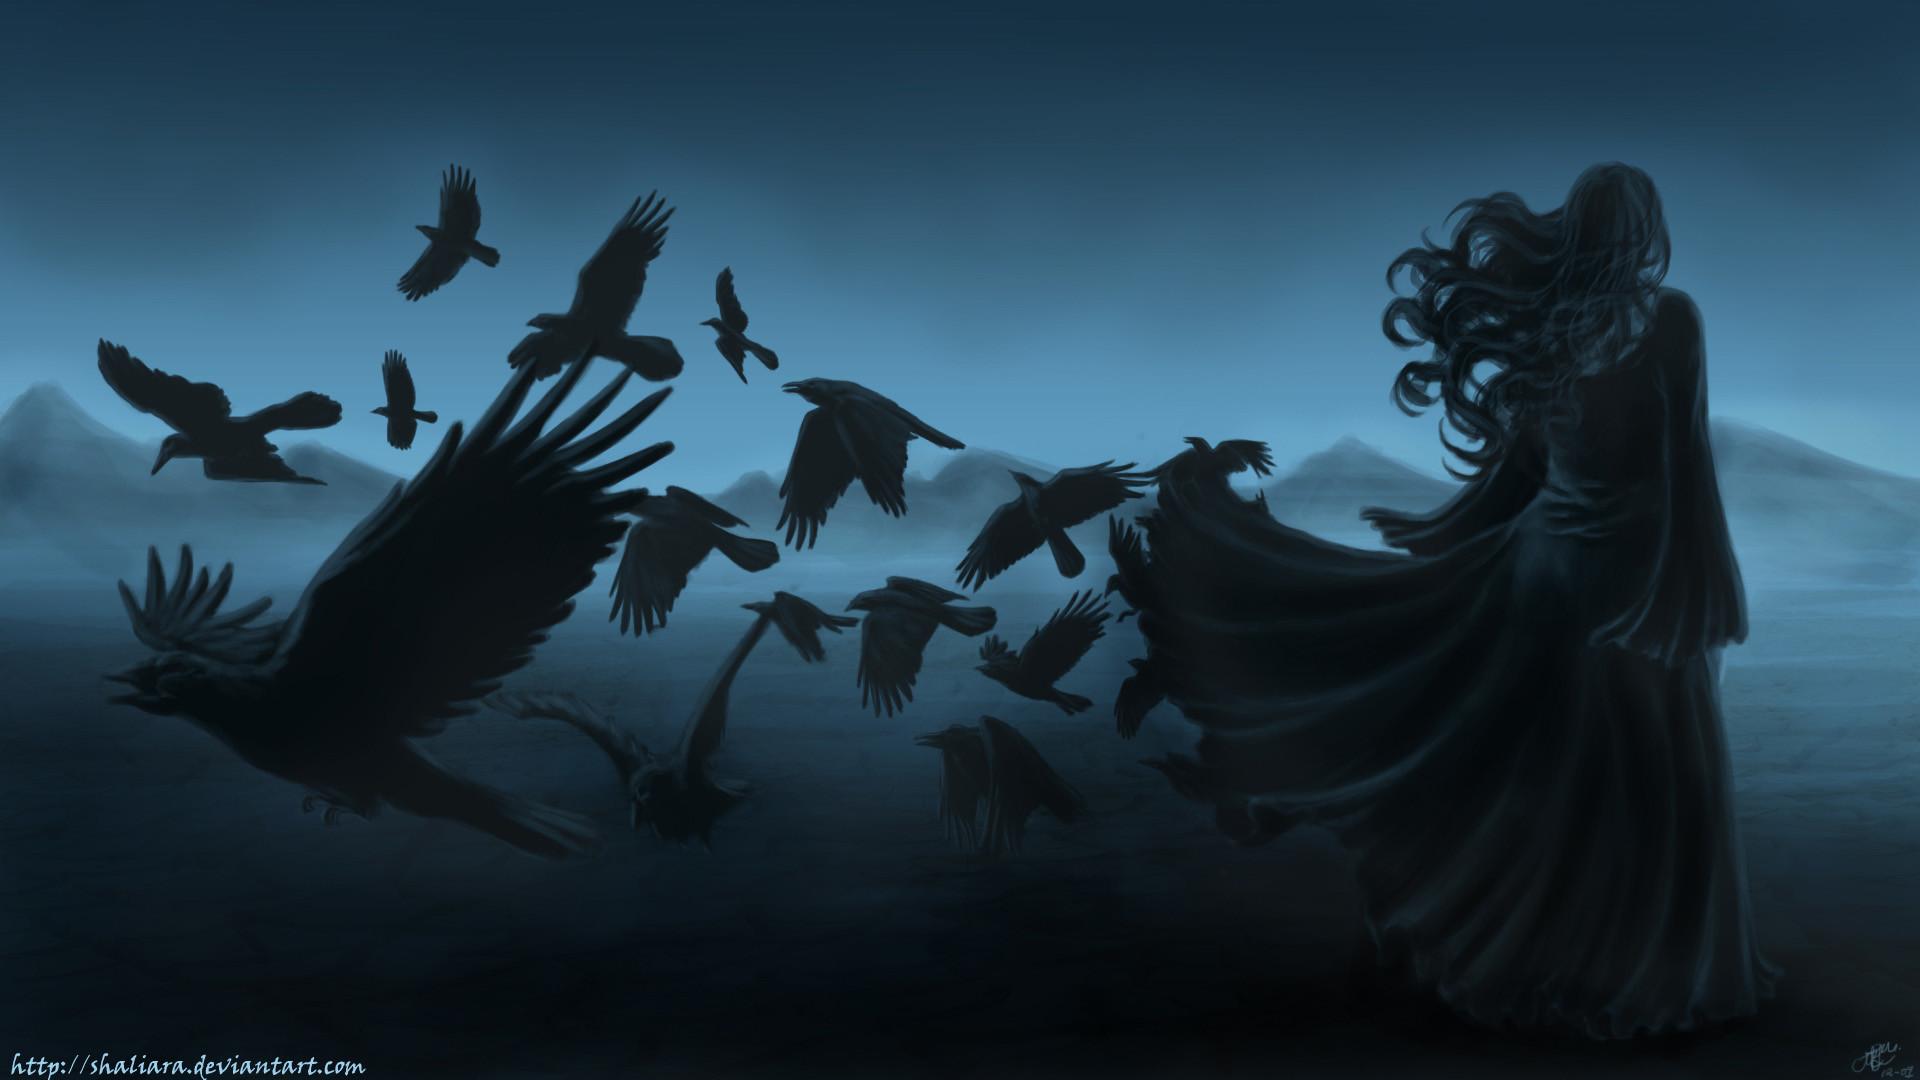 dark horror gothic women raven poe birds art mood wallpaper background